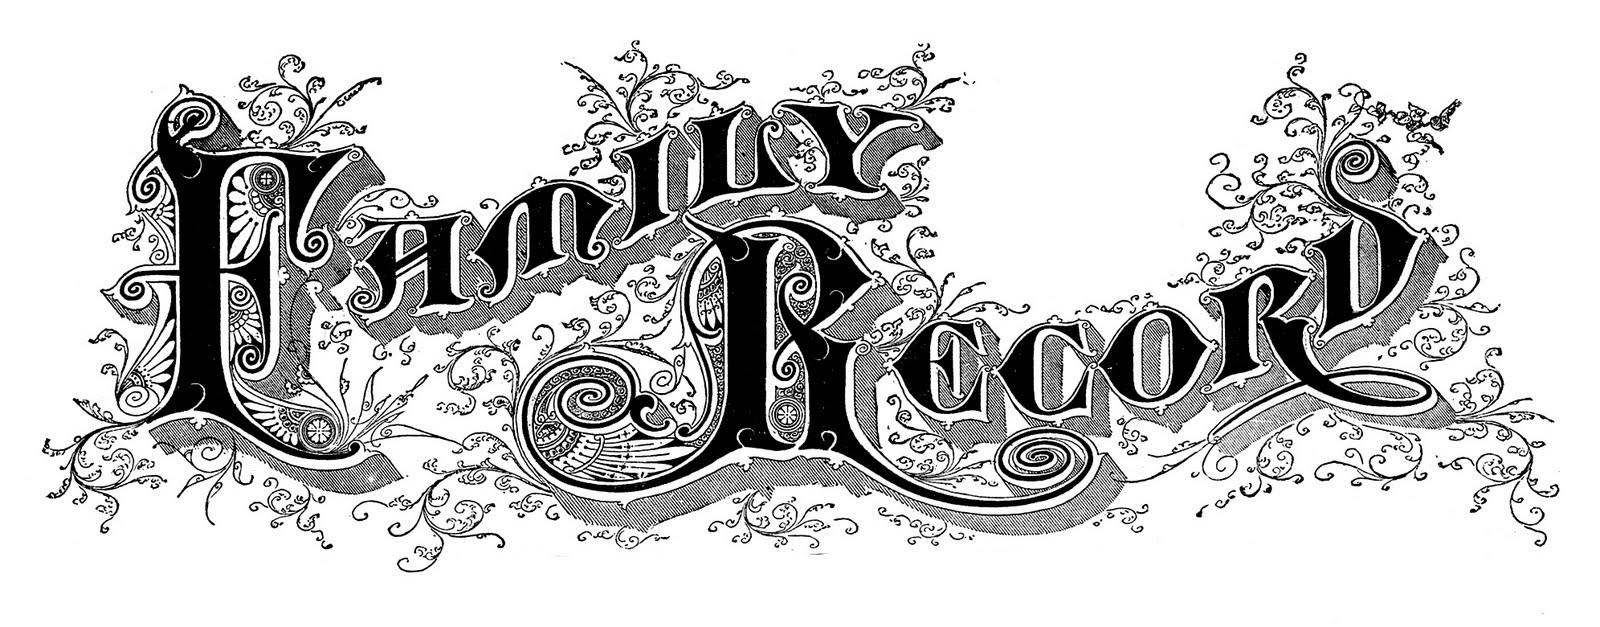 Family Tree Clip Art Free Genealogy Graphics And Clip Art.